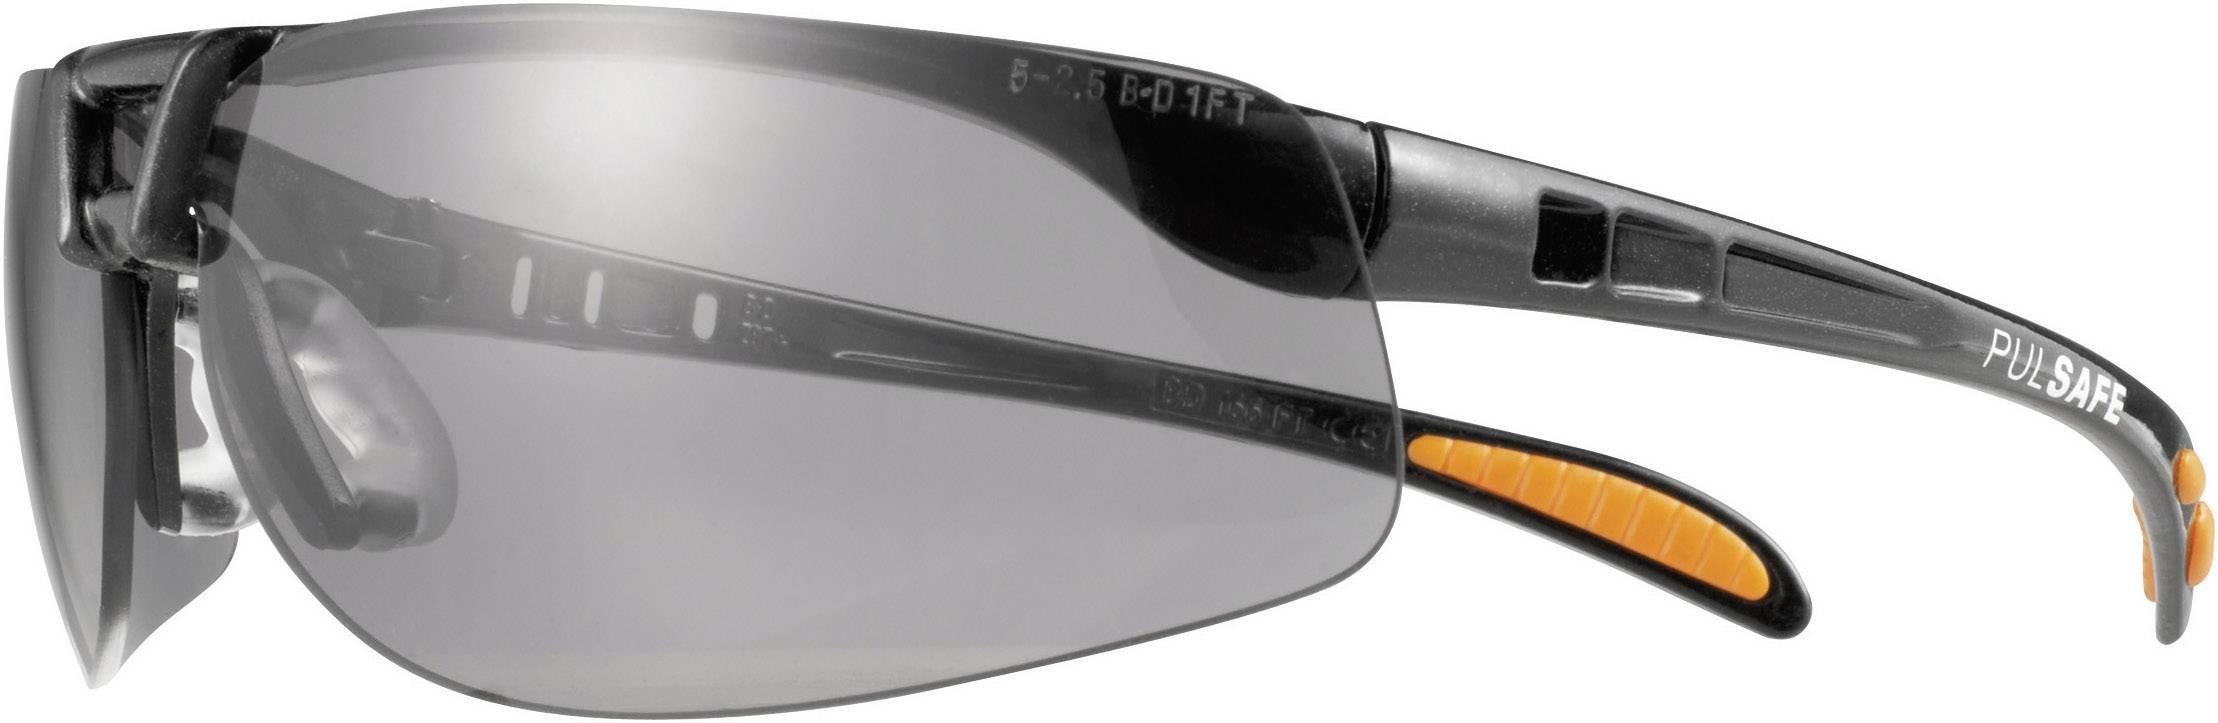 Ochranné brýle Pulsafe Protégé, 10 153 63, šedá